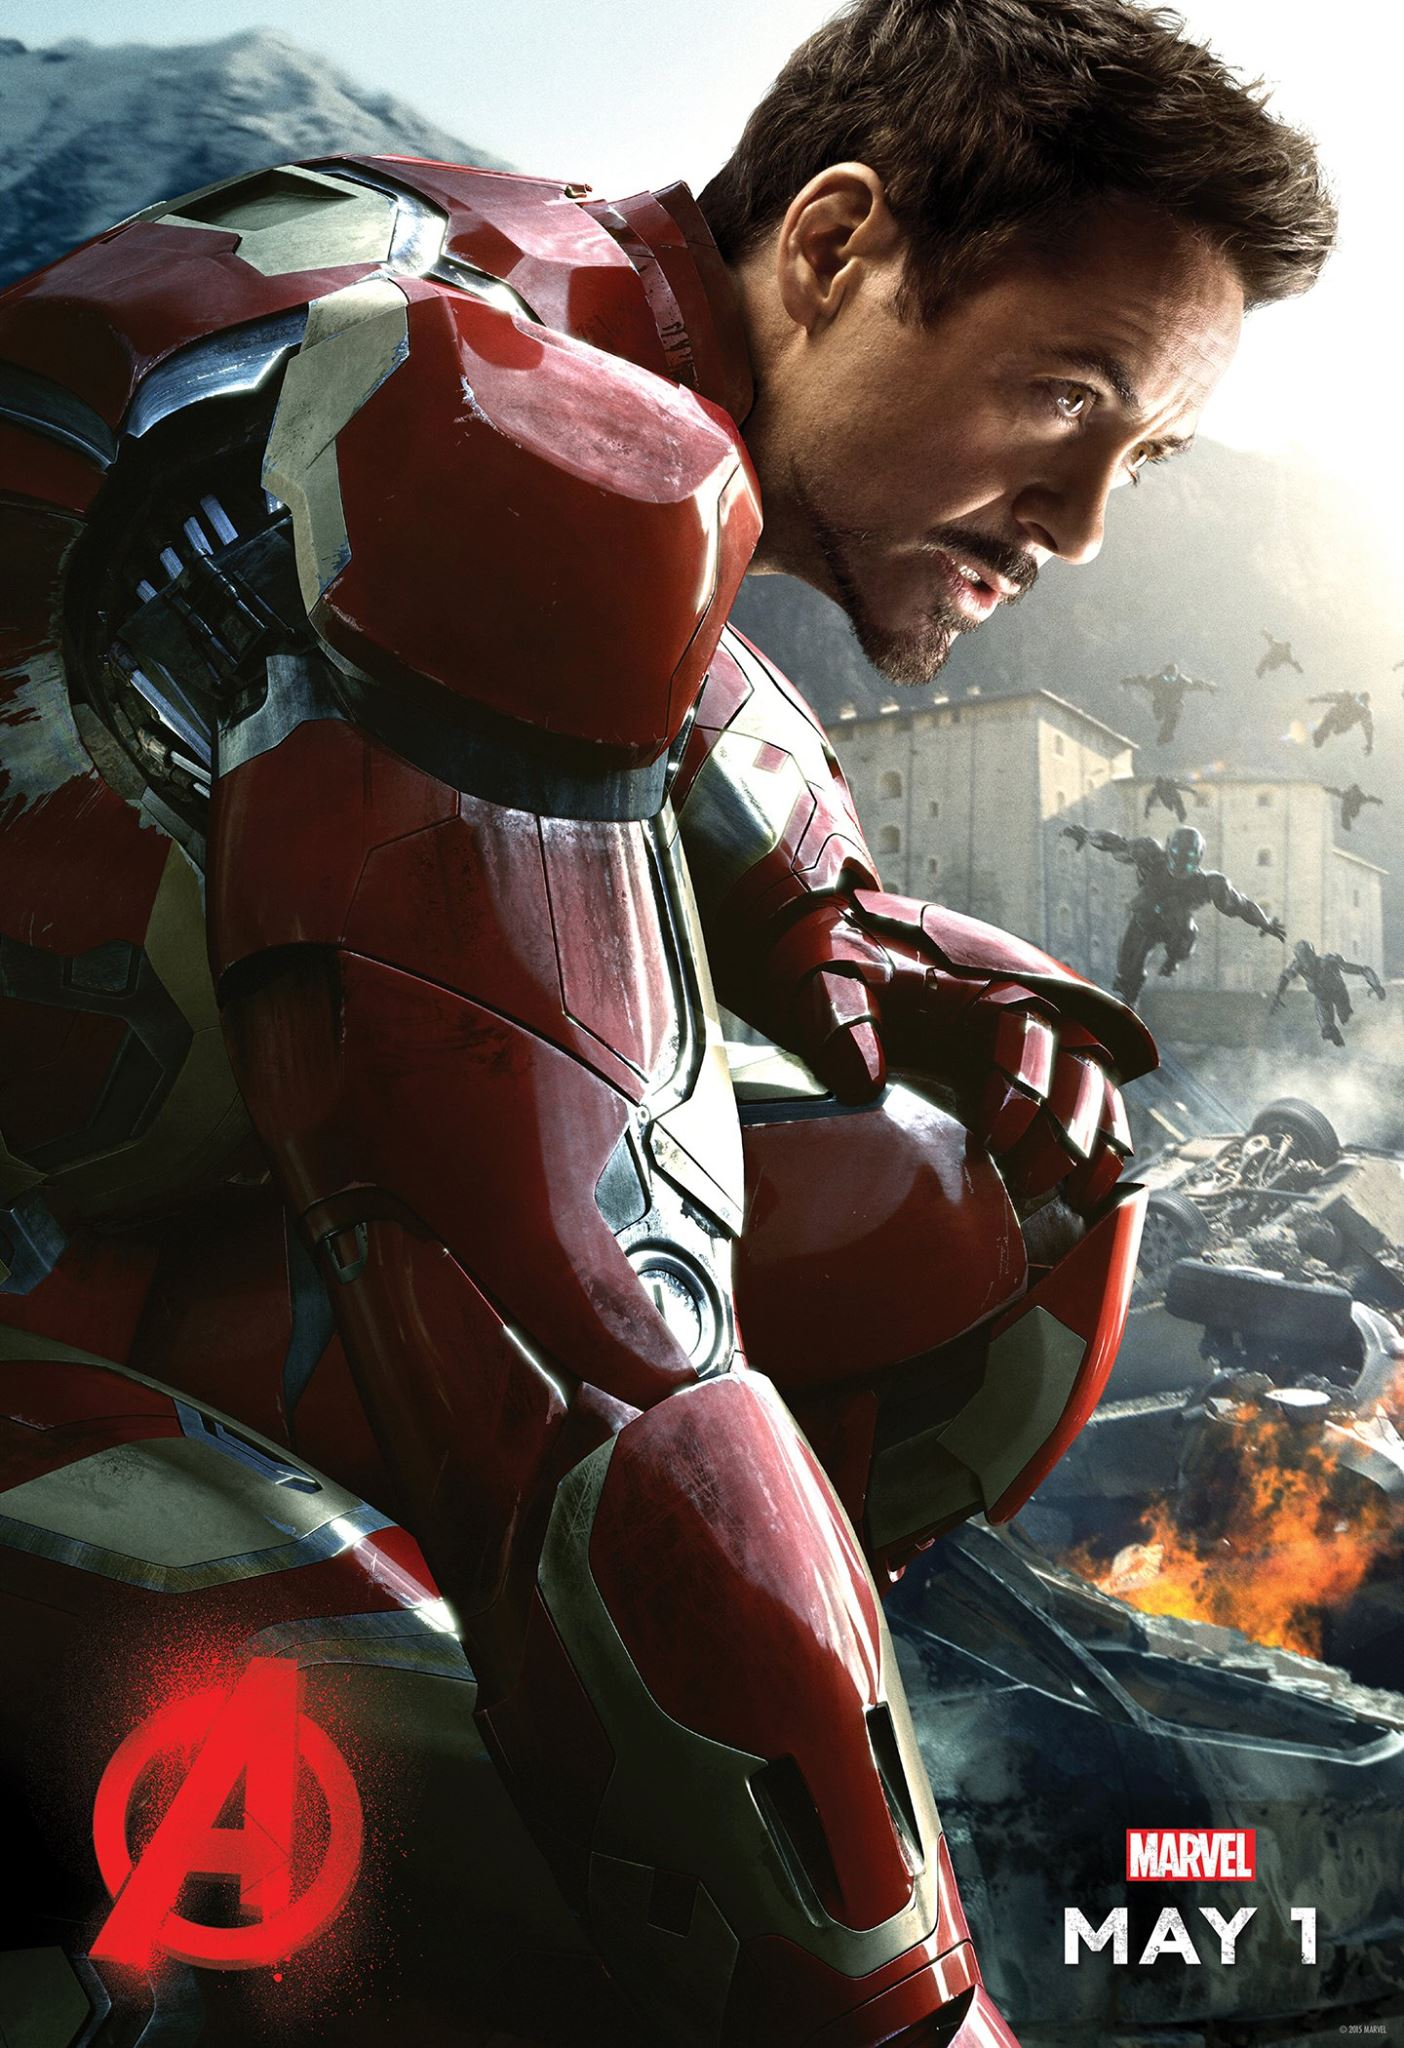 Avengers-2-Age-of-Ultron-Robert-Downey-Jr-Iron-Man-Poster